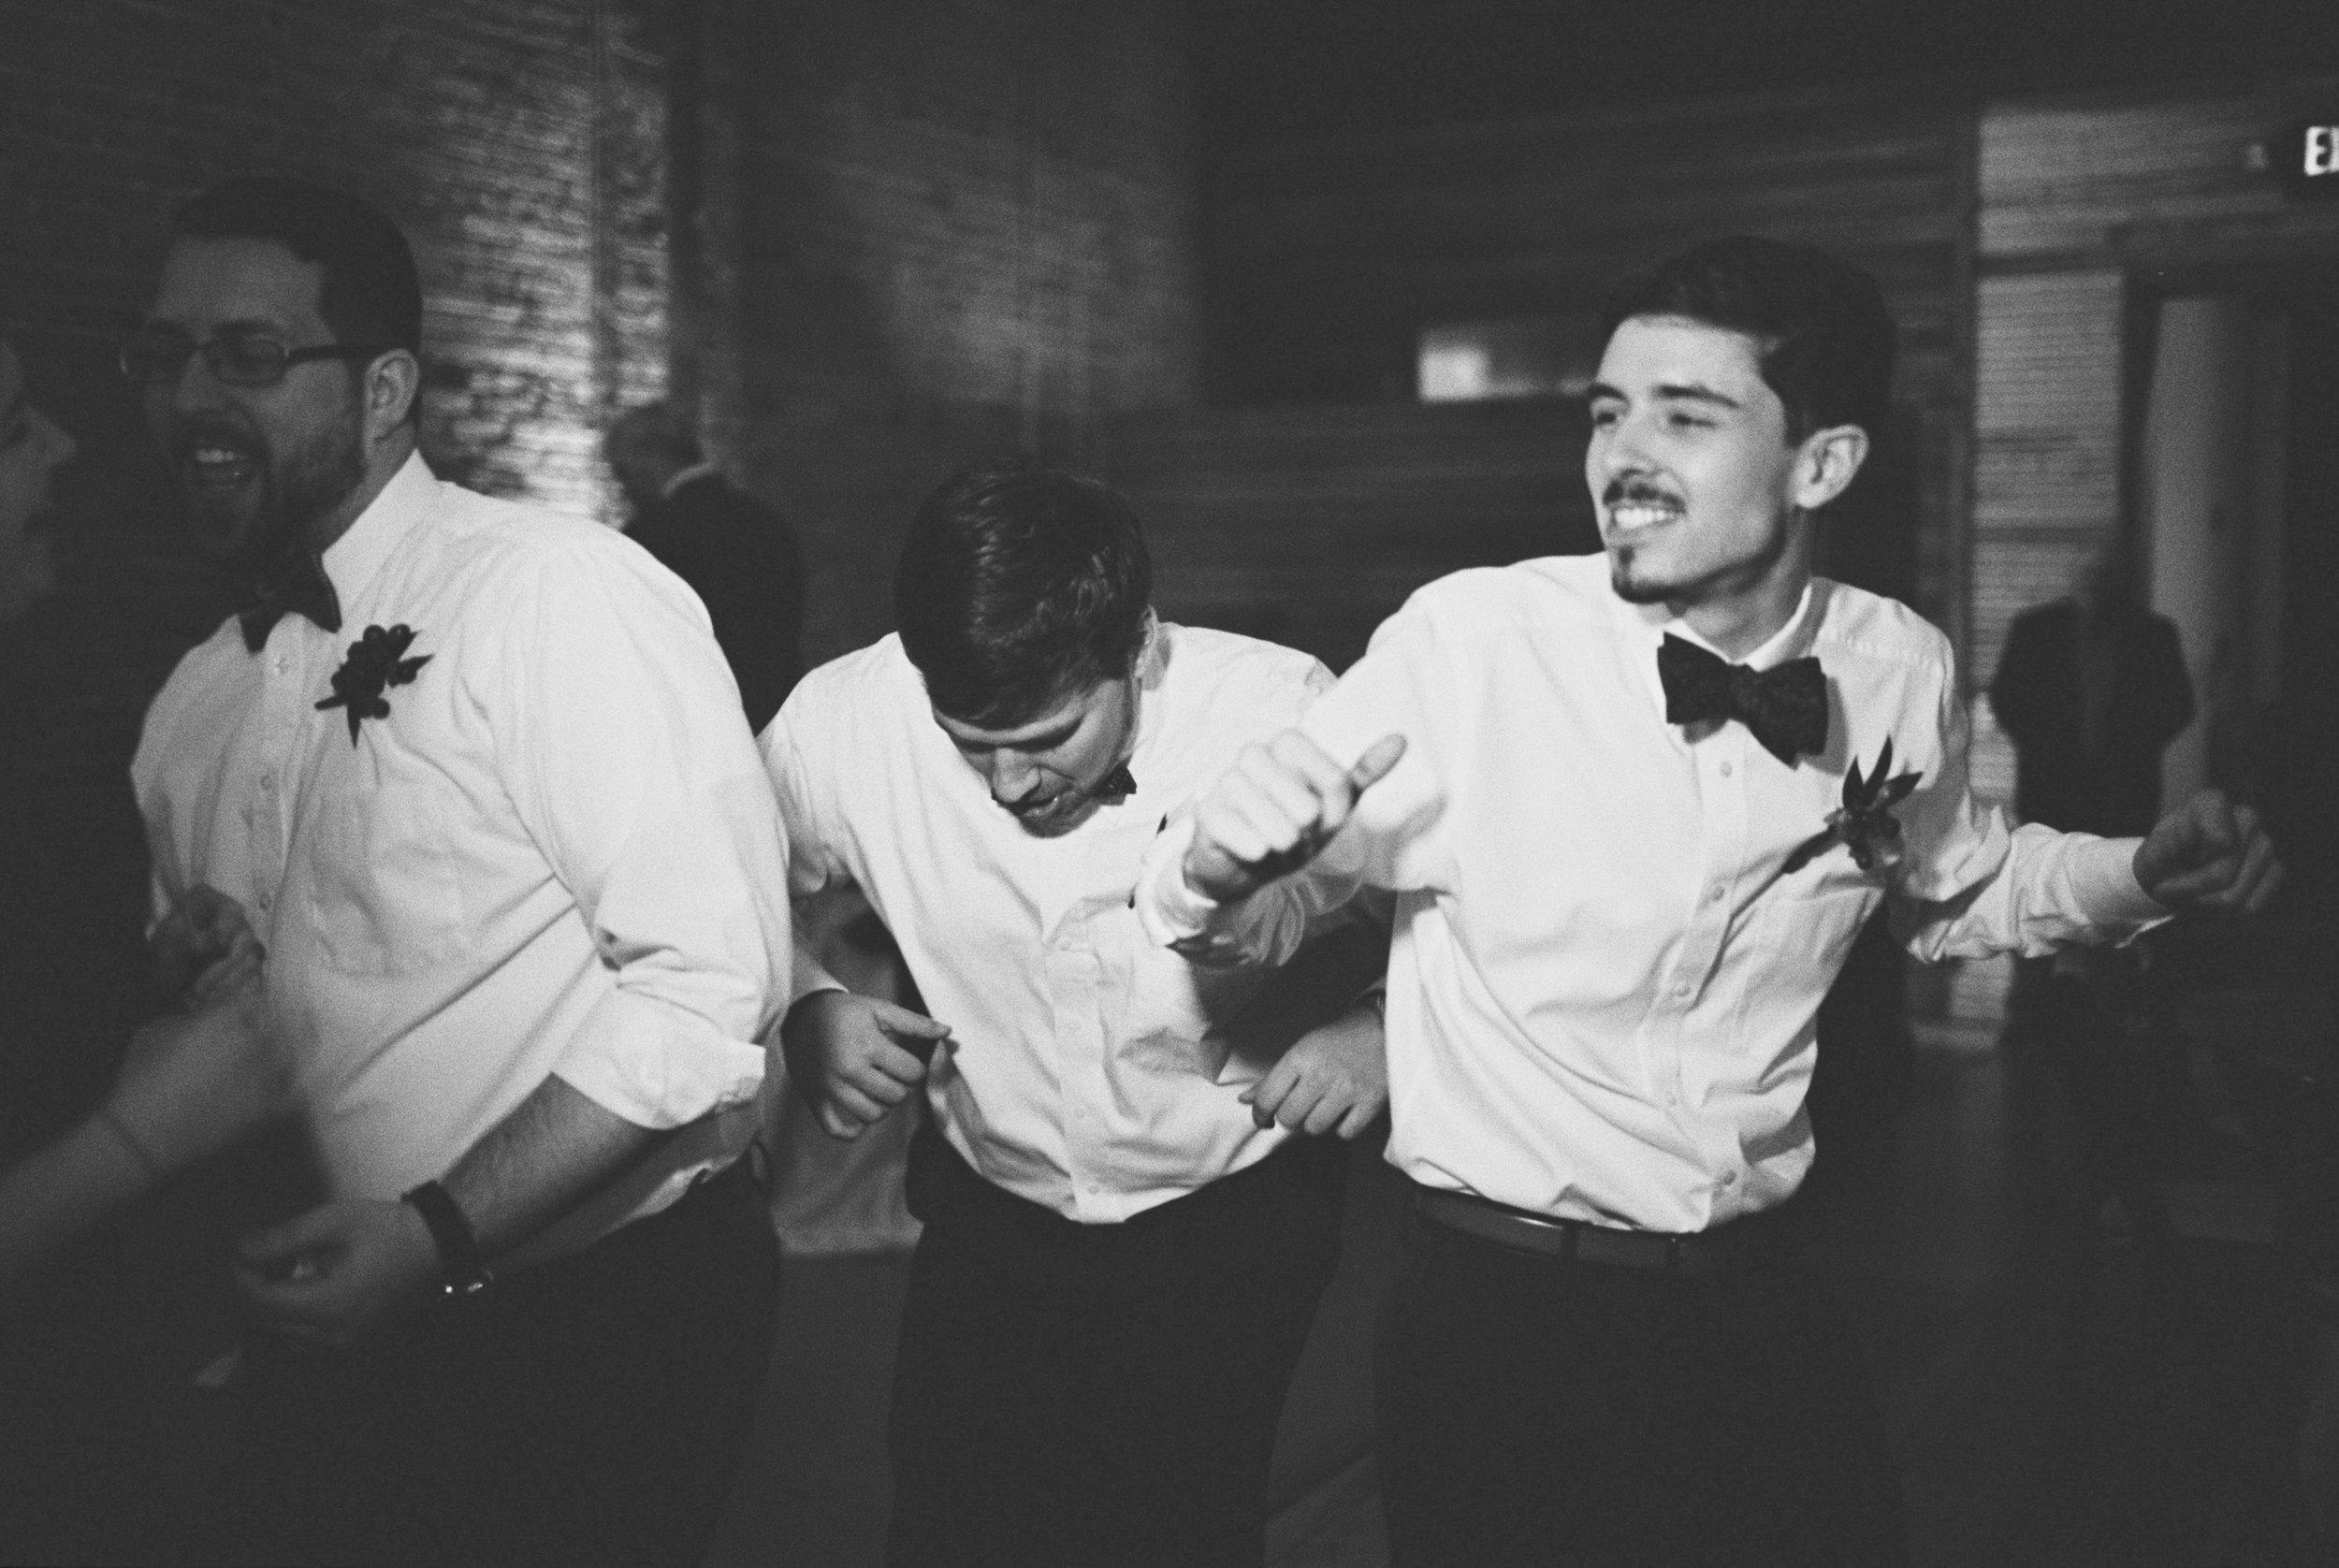 Lauren_Jeremy_Standard_Wedding_Knoxville_Abigail_Malone_Photography_FIlm-587.jpg